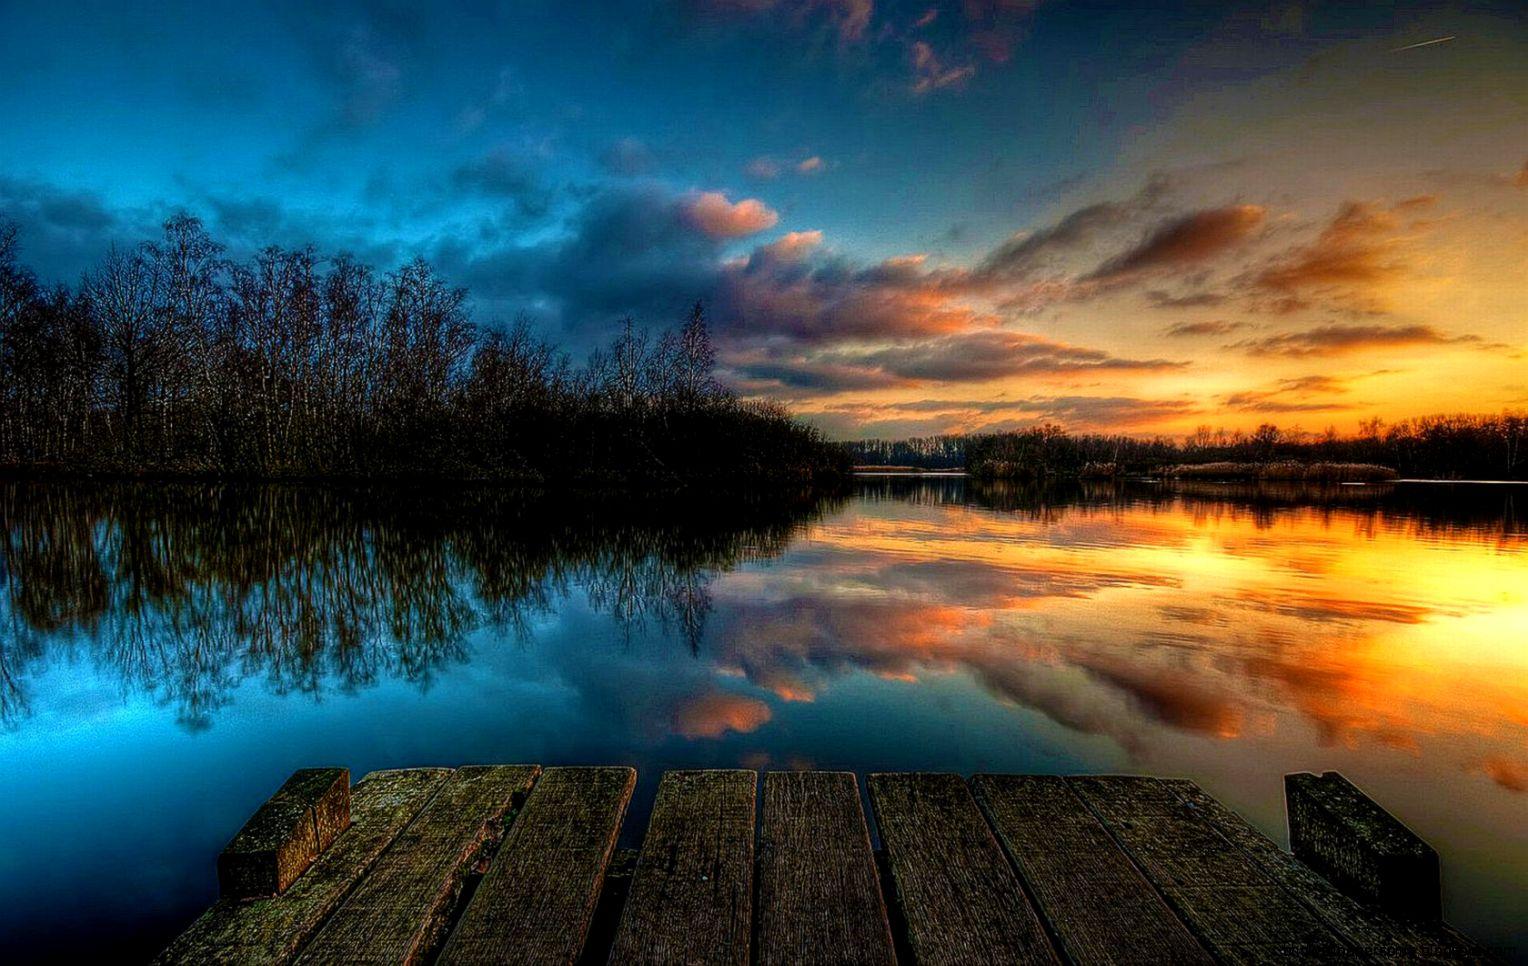 Sunset Wallpaper Hd | HD Wallpapers Plus